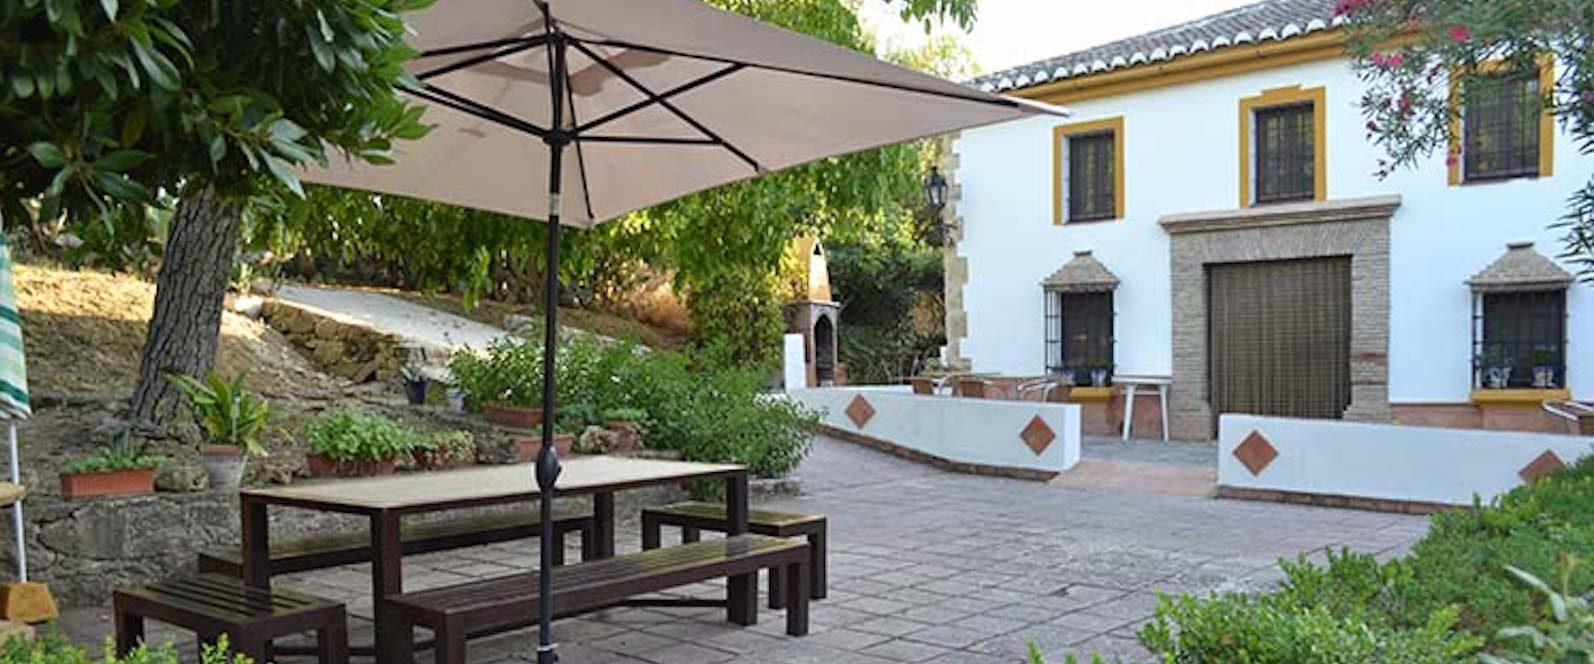 Home olvera properties - Casa antonio zahara ...